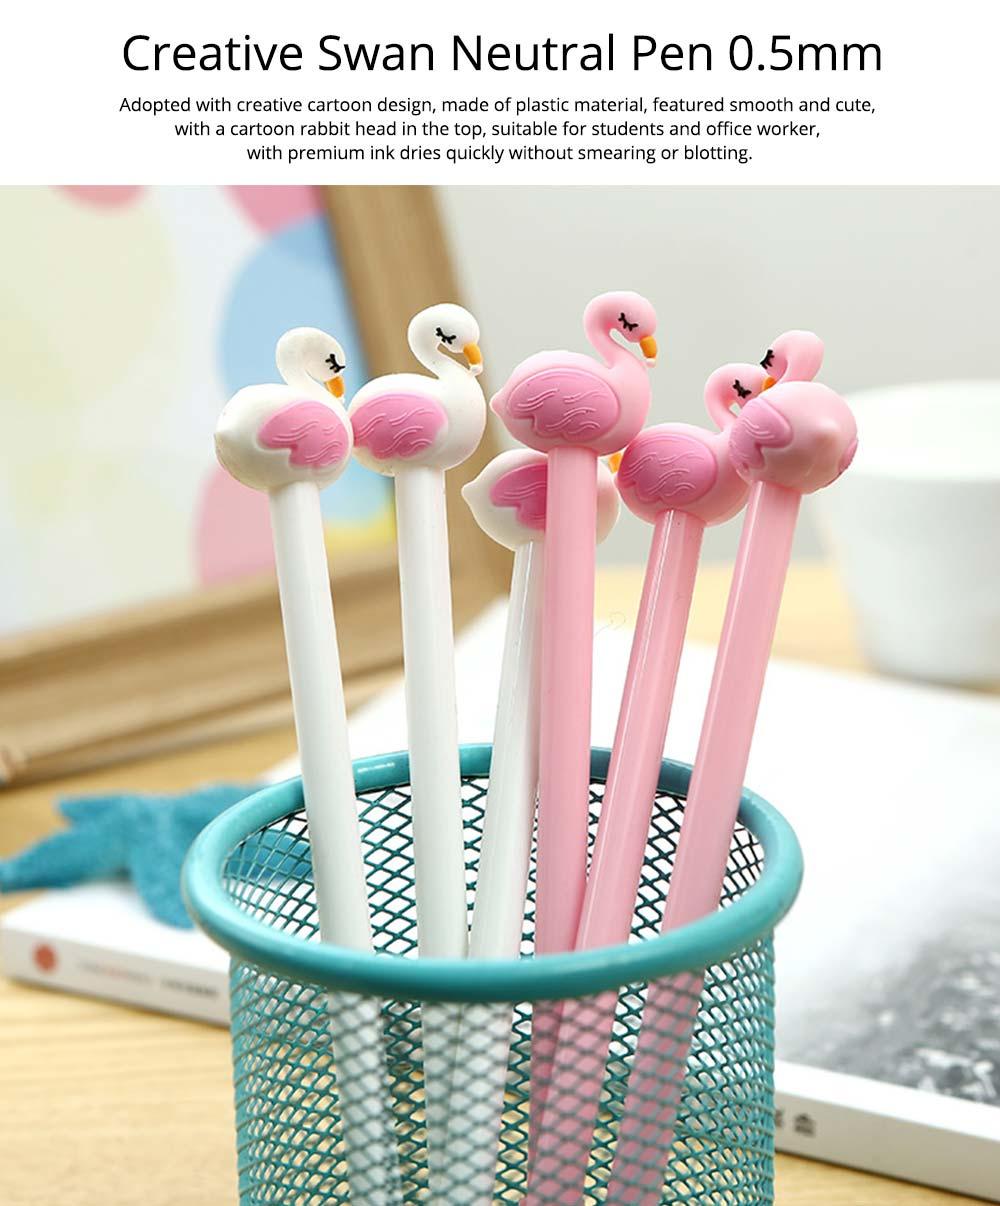 Cute Gel Pen - Creative Pink White Cartoon Swan Gel Pen, 0.5mm 0